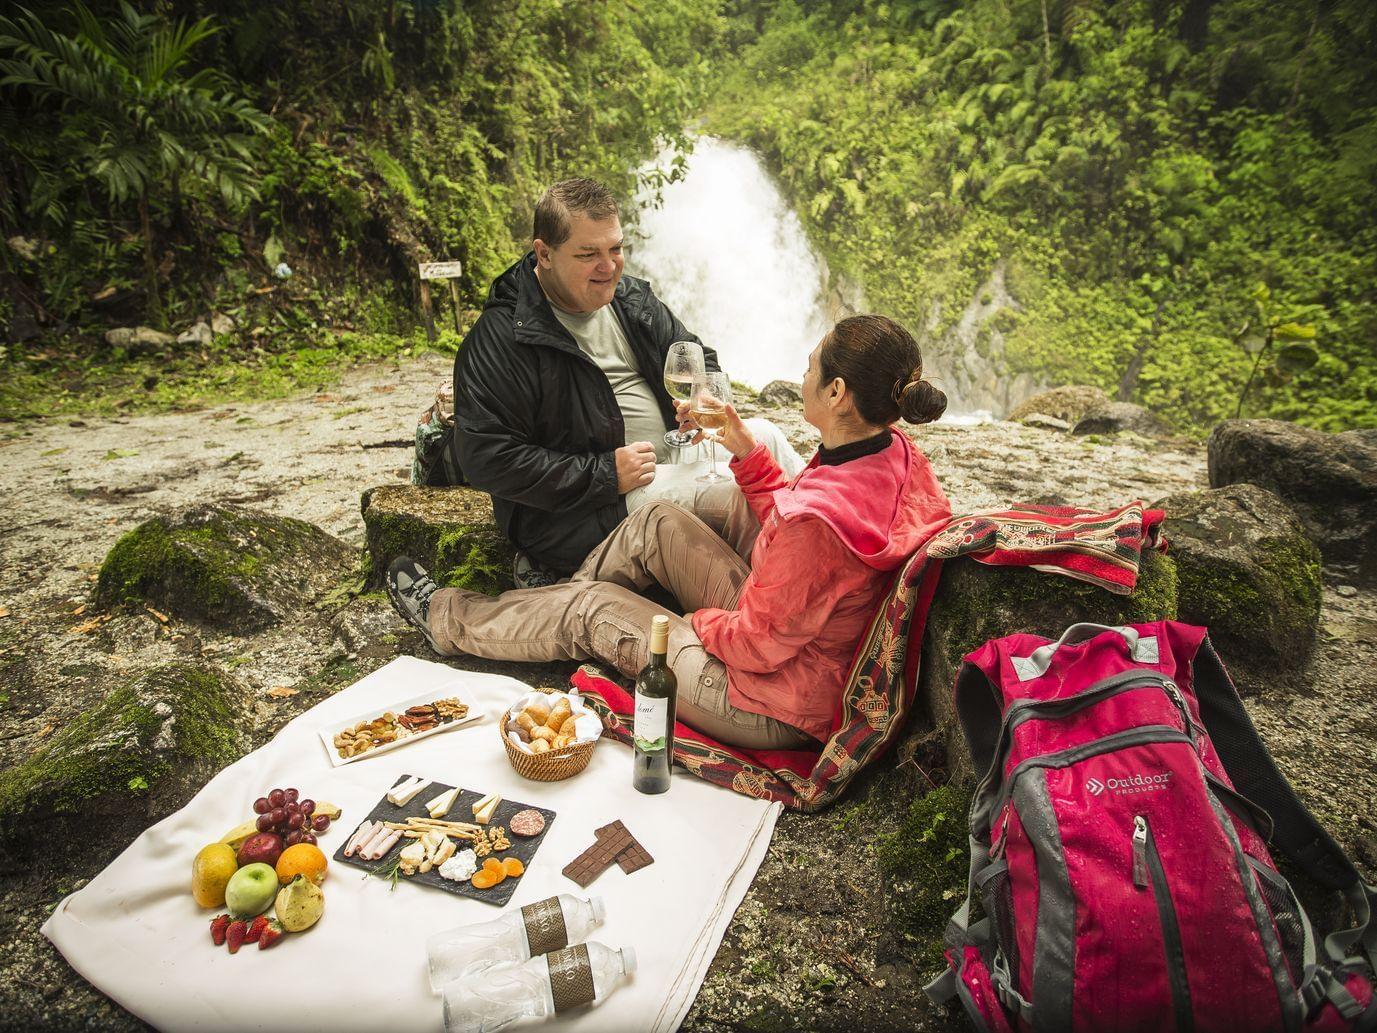 Picnic near a waterfall in Mandor Valley near Hotel Sumaq